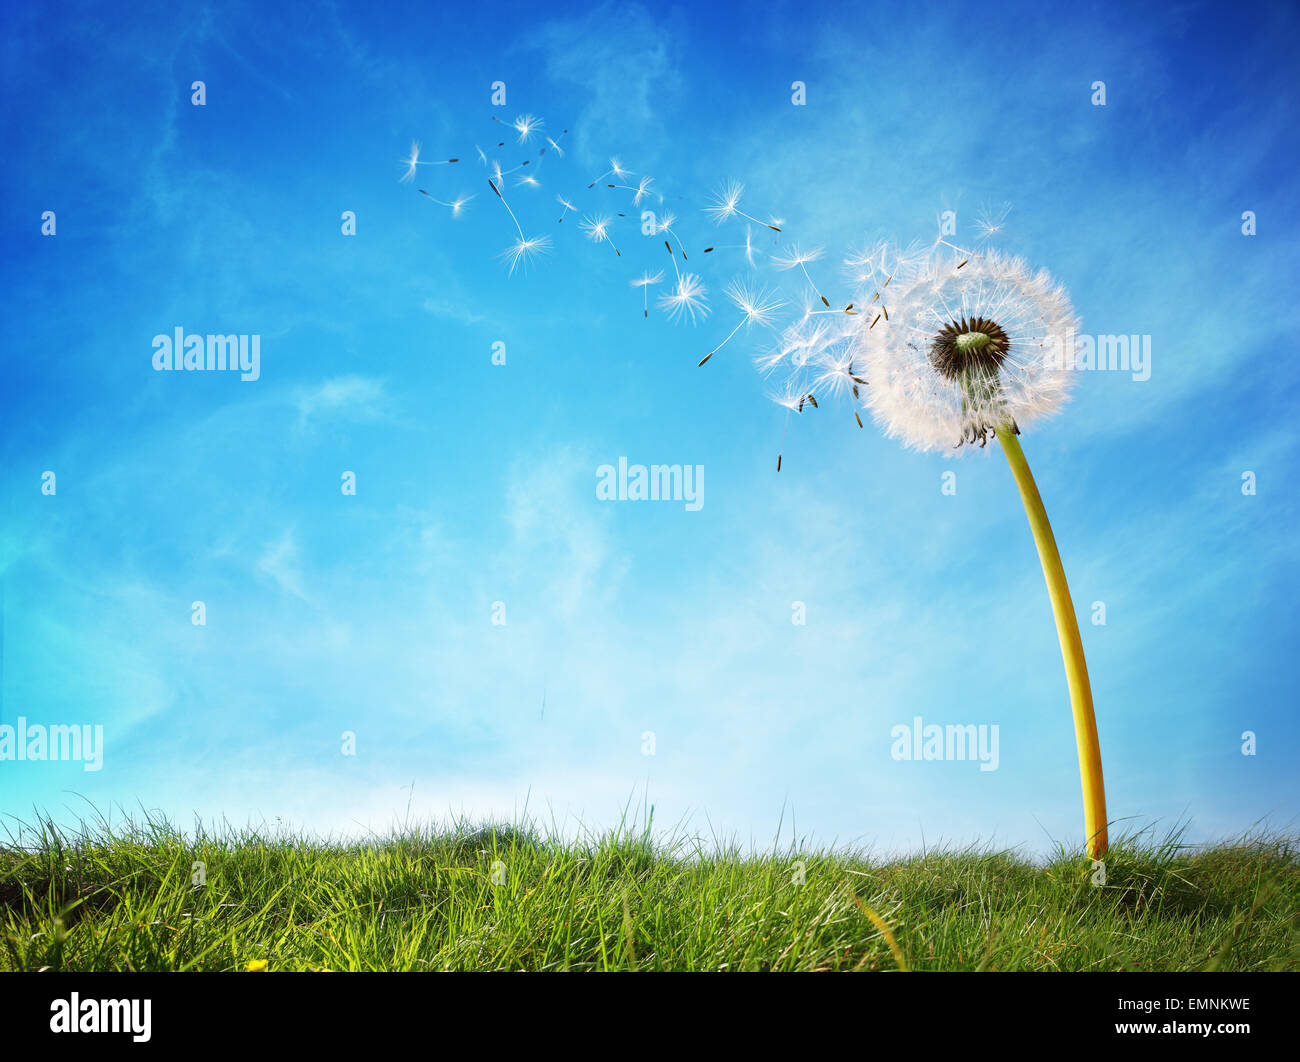 Dandelion clock dispersing seed - Stock Image